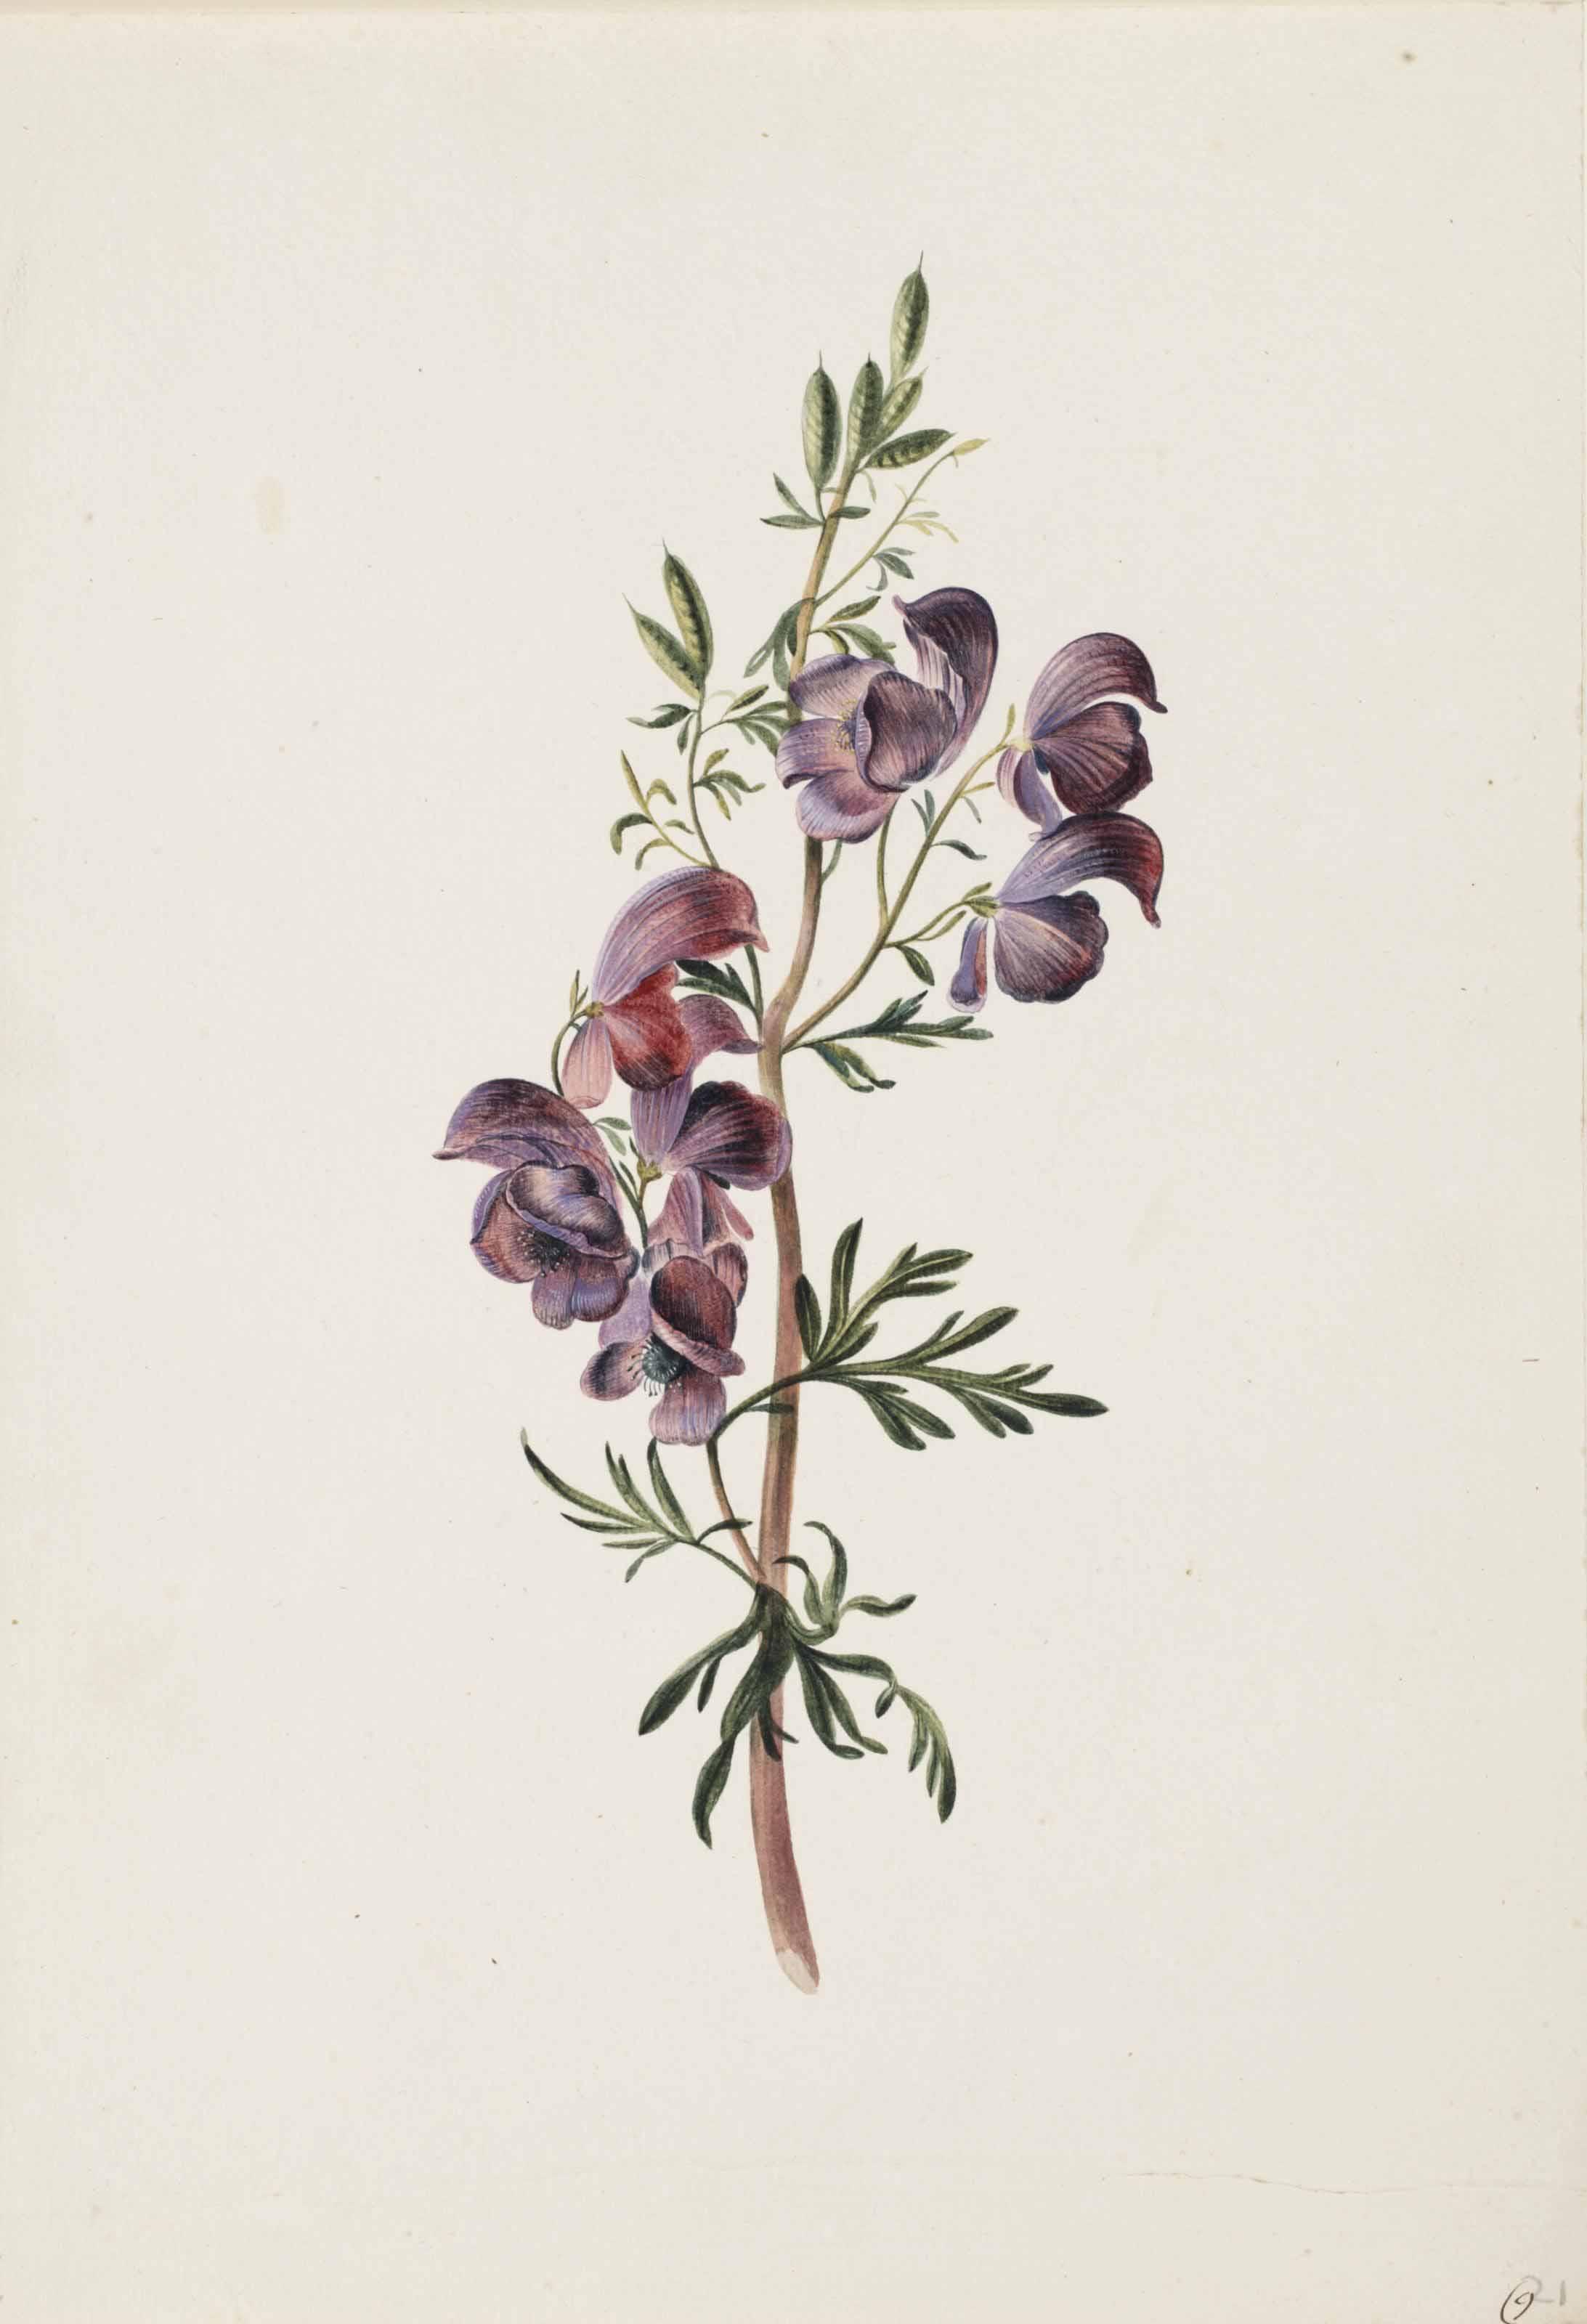 Aconitum or Monkshood